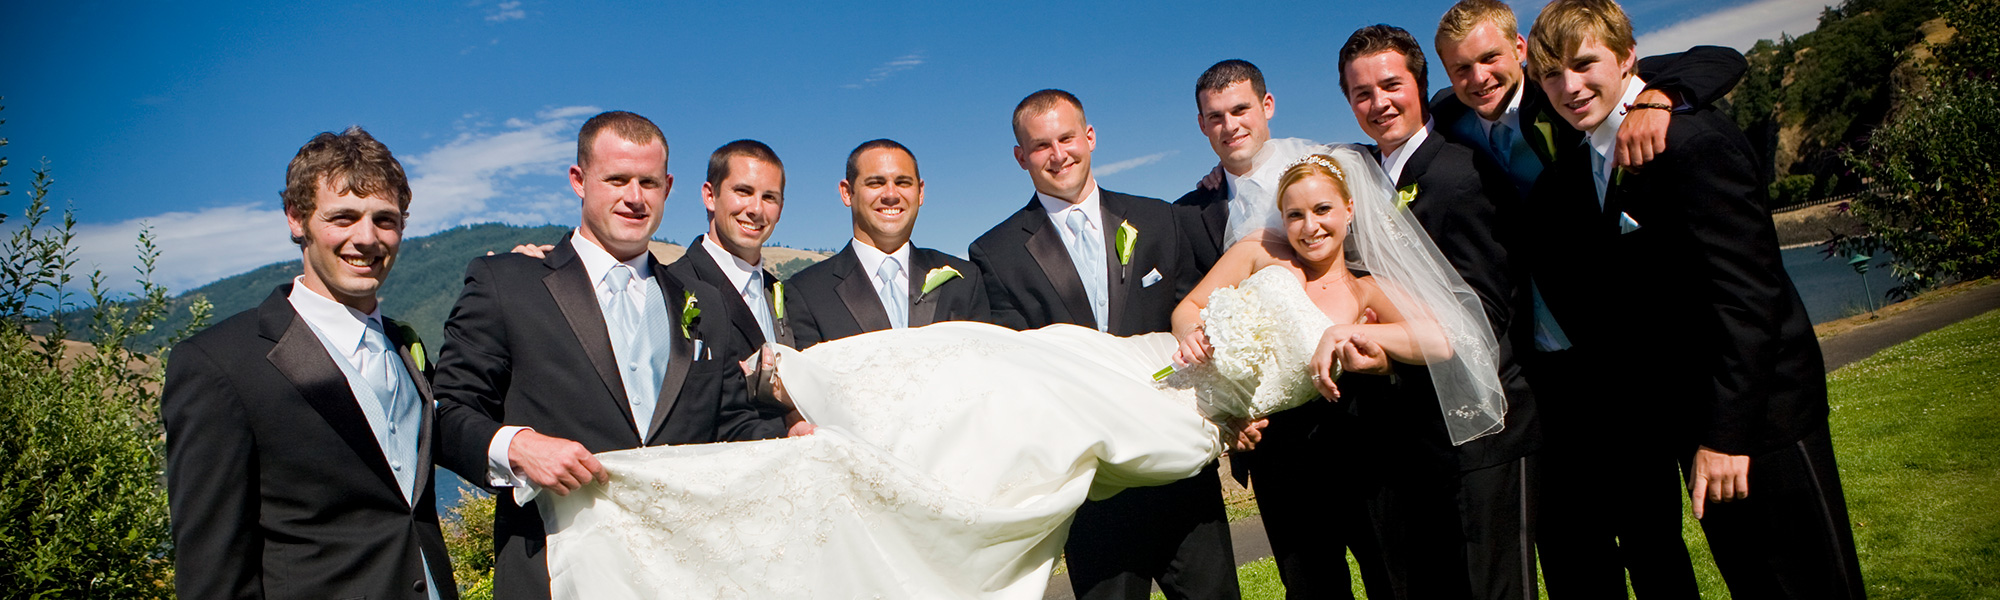 groomsman holding bride